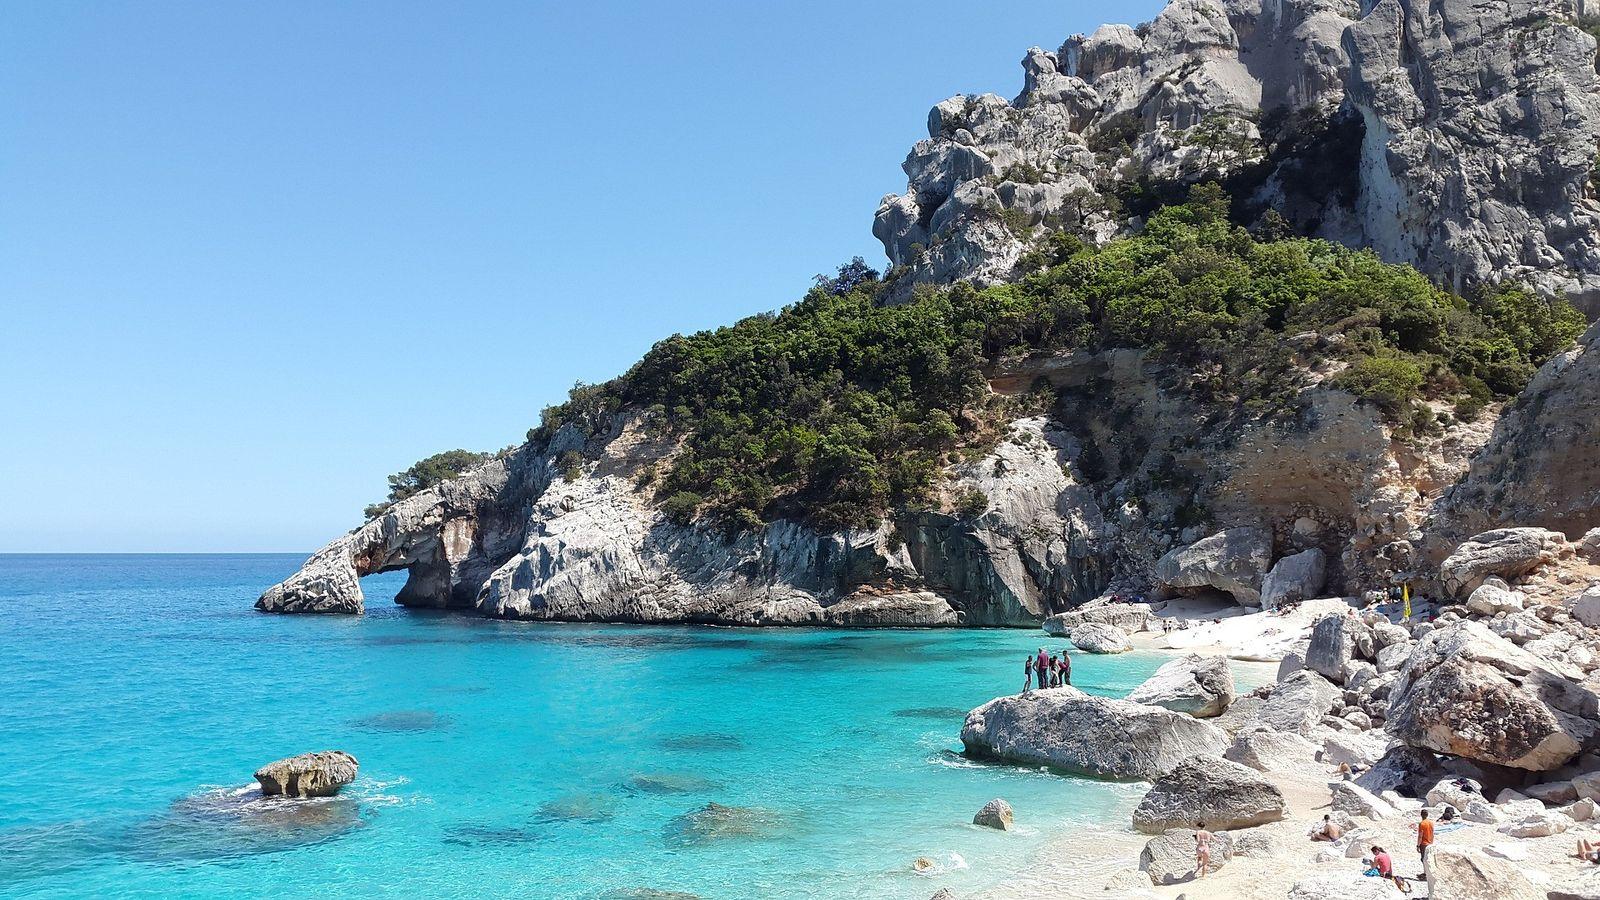 Salvemos nuestro Mediterráneo zonas muertas